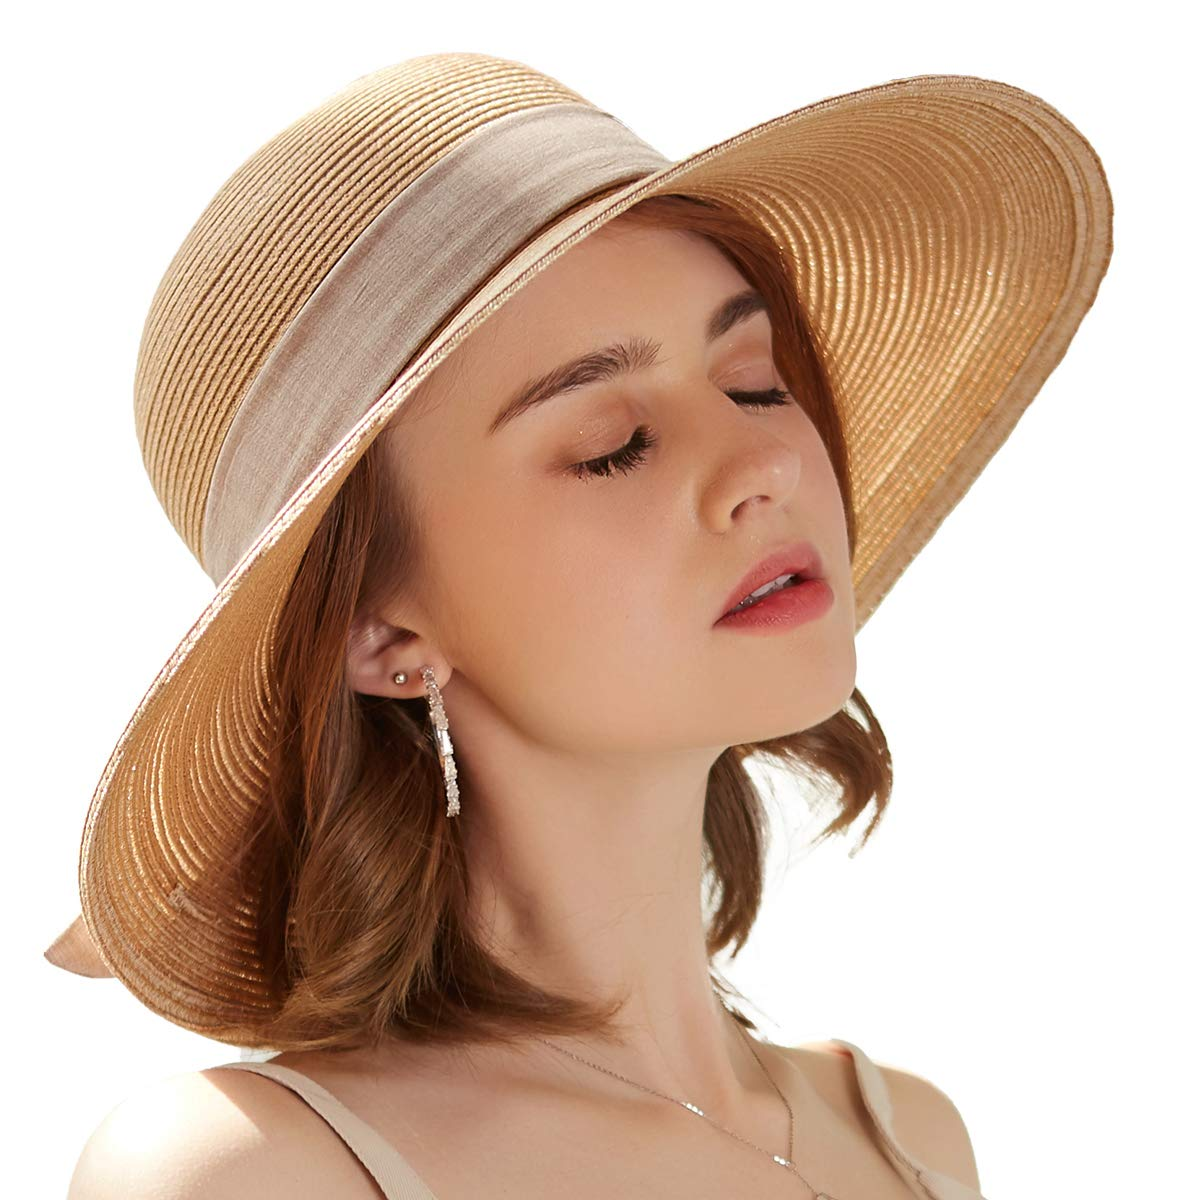 SOMALER Women Floppy Sun Hat Summer Wide Brim Beach Cap Packable Cotton Straw Hat for Travel by SOMALER (Image #3)